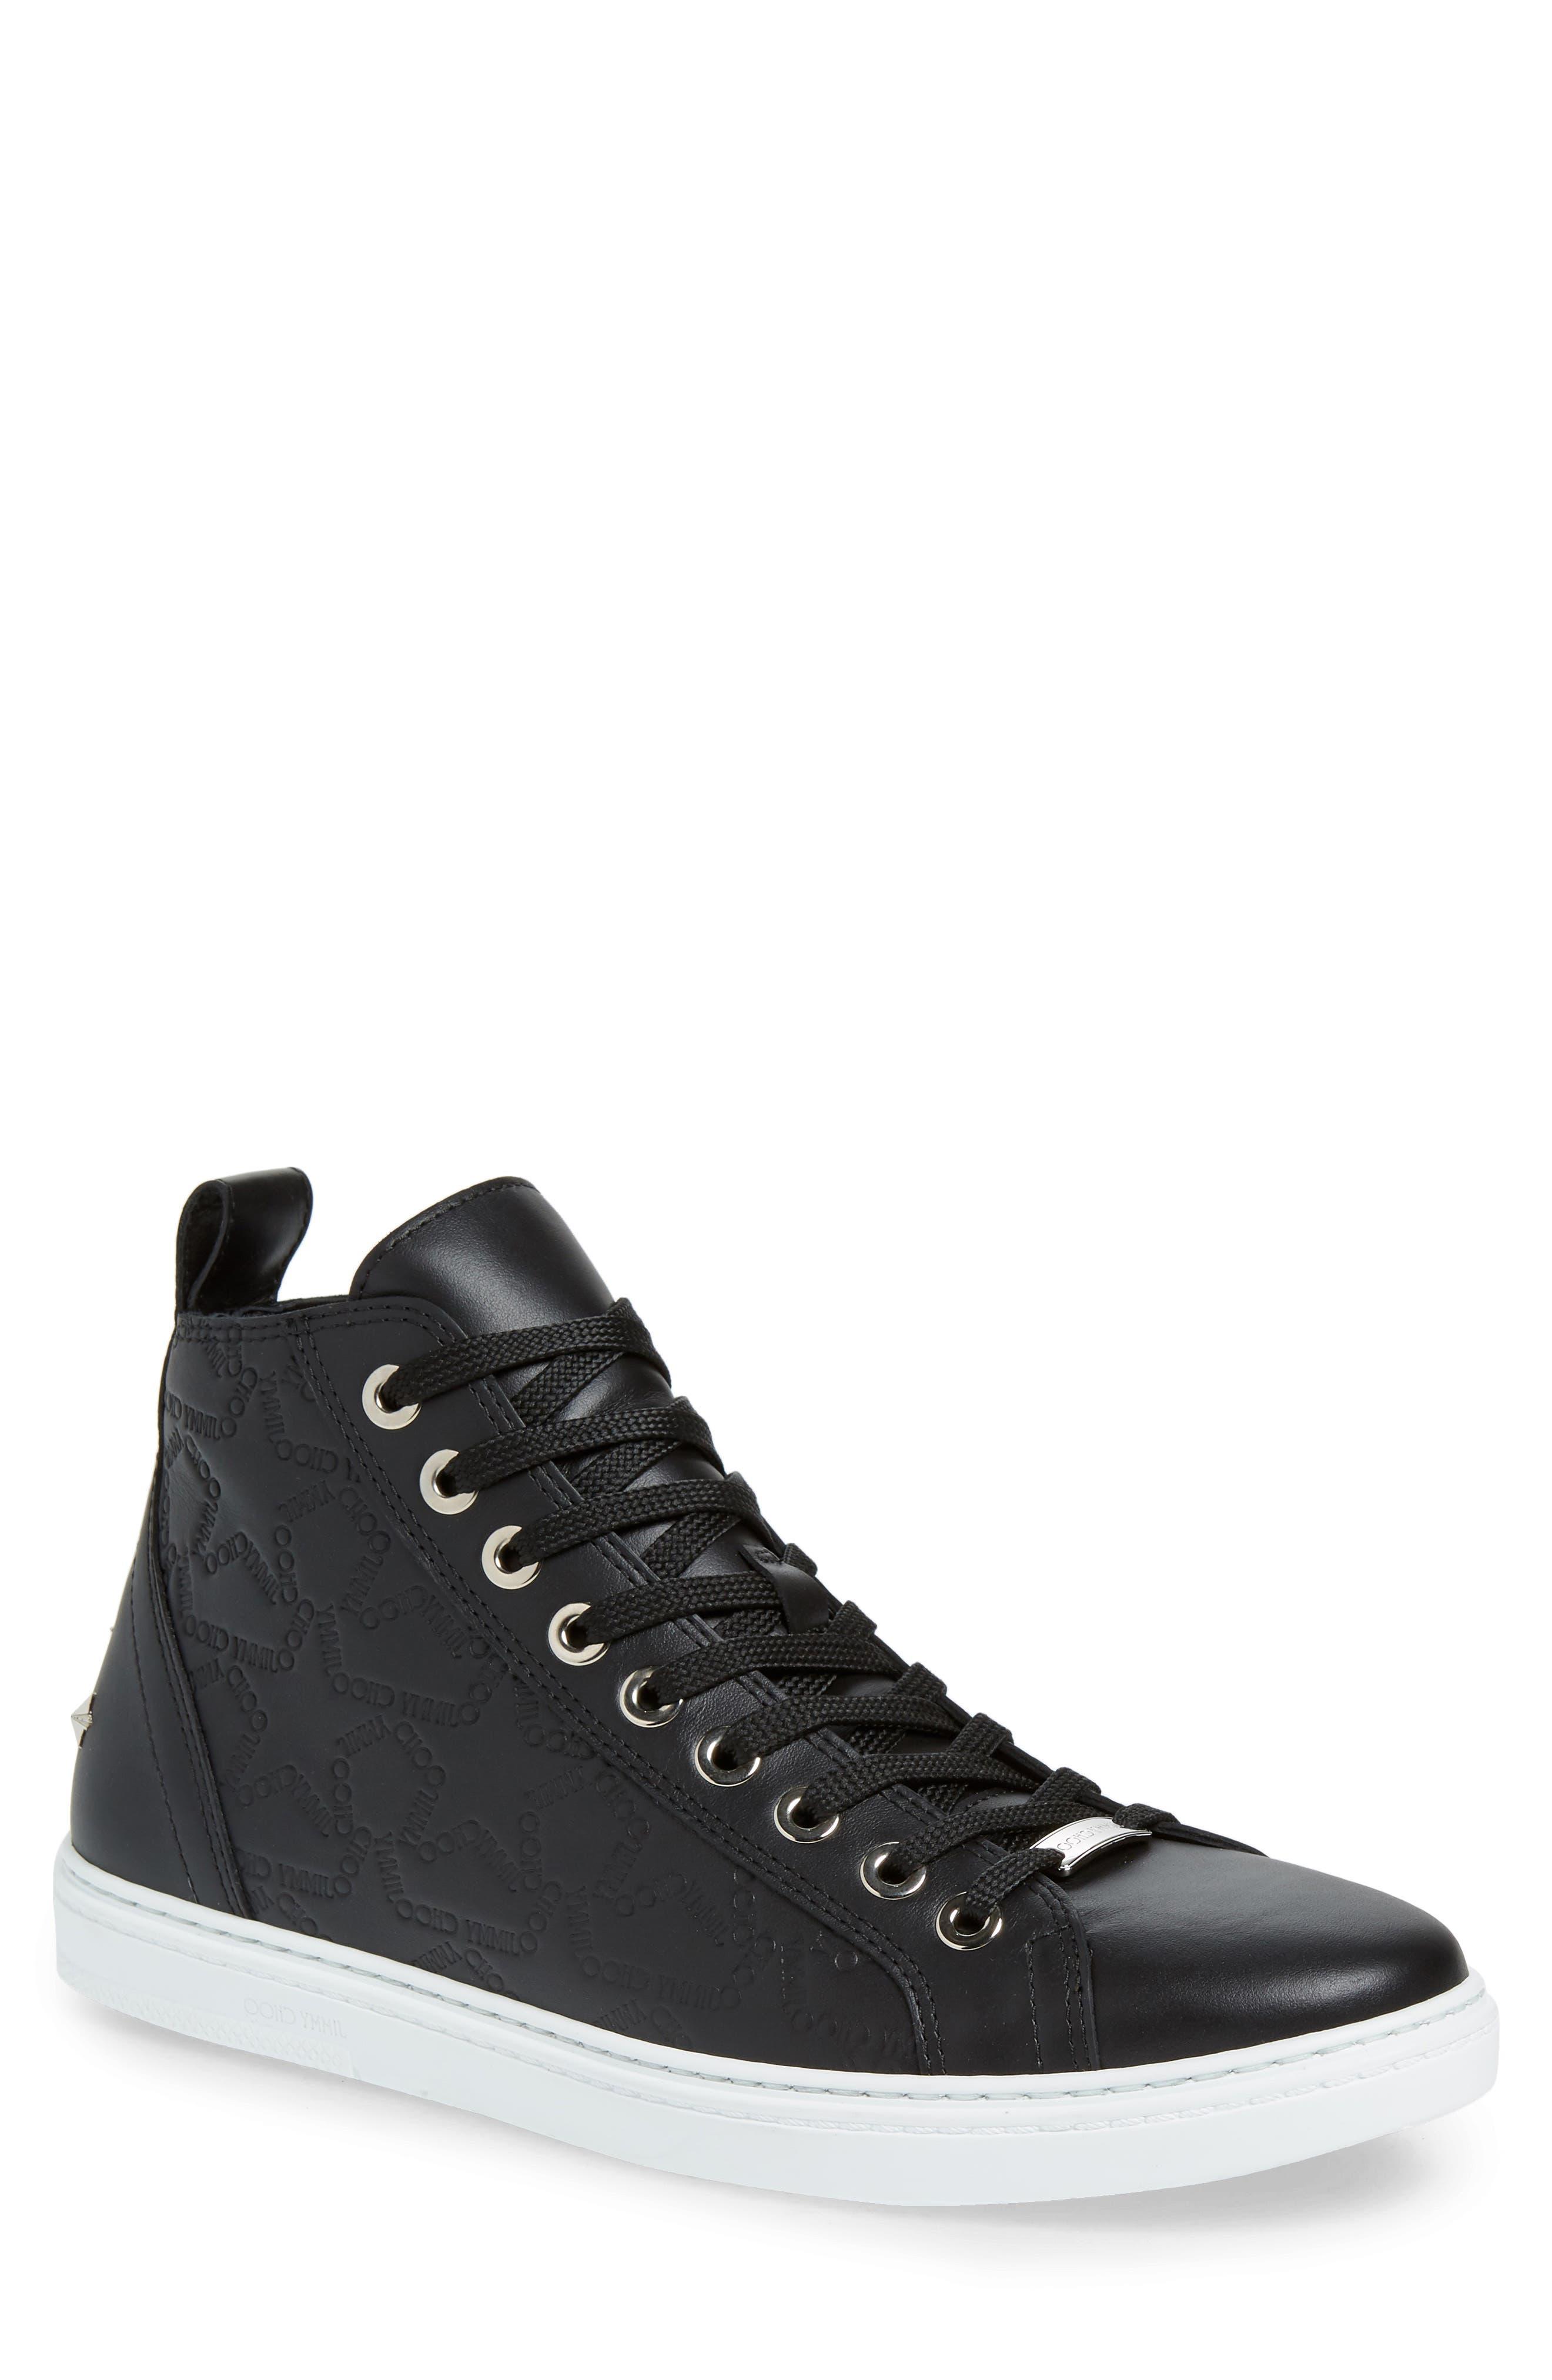 JIMMY CHOO, Colt High Top Sneaker, Main thumbnail 1, color, BLACK